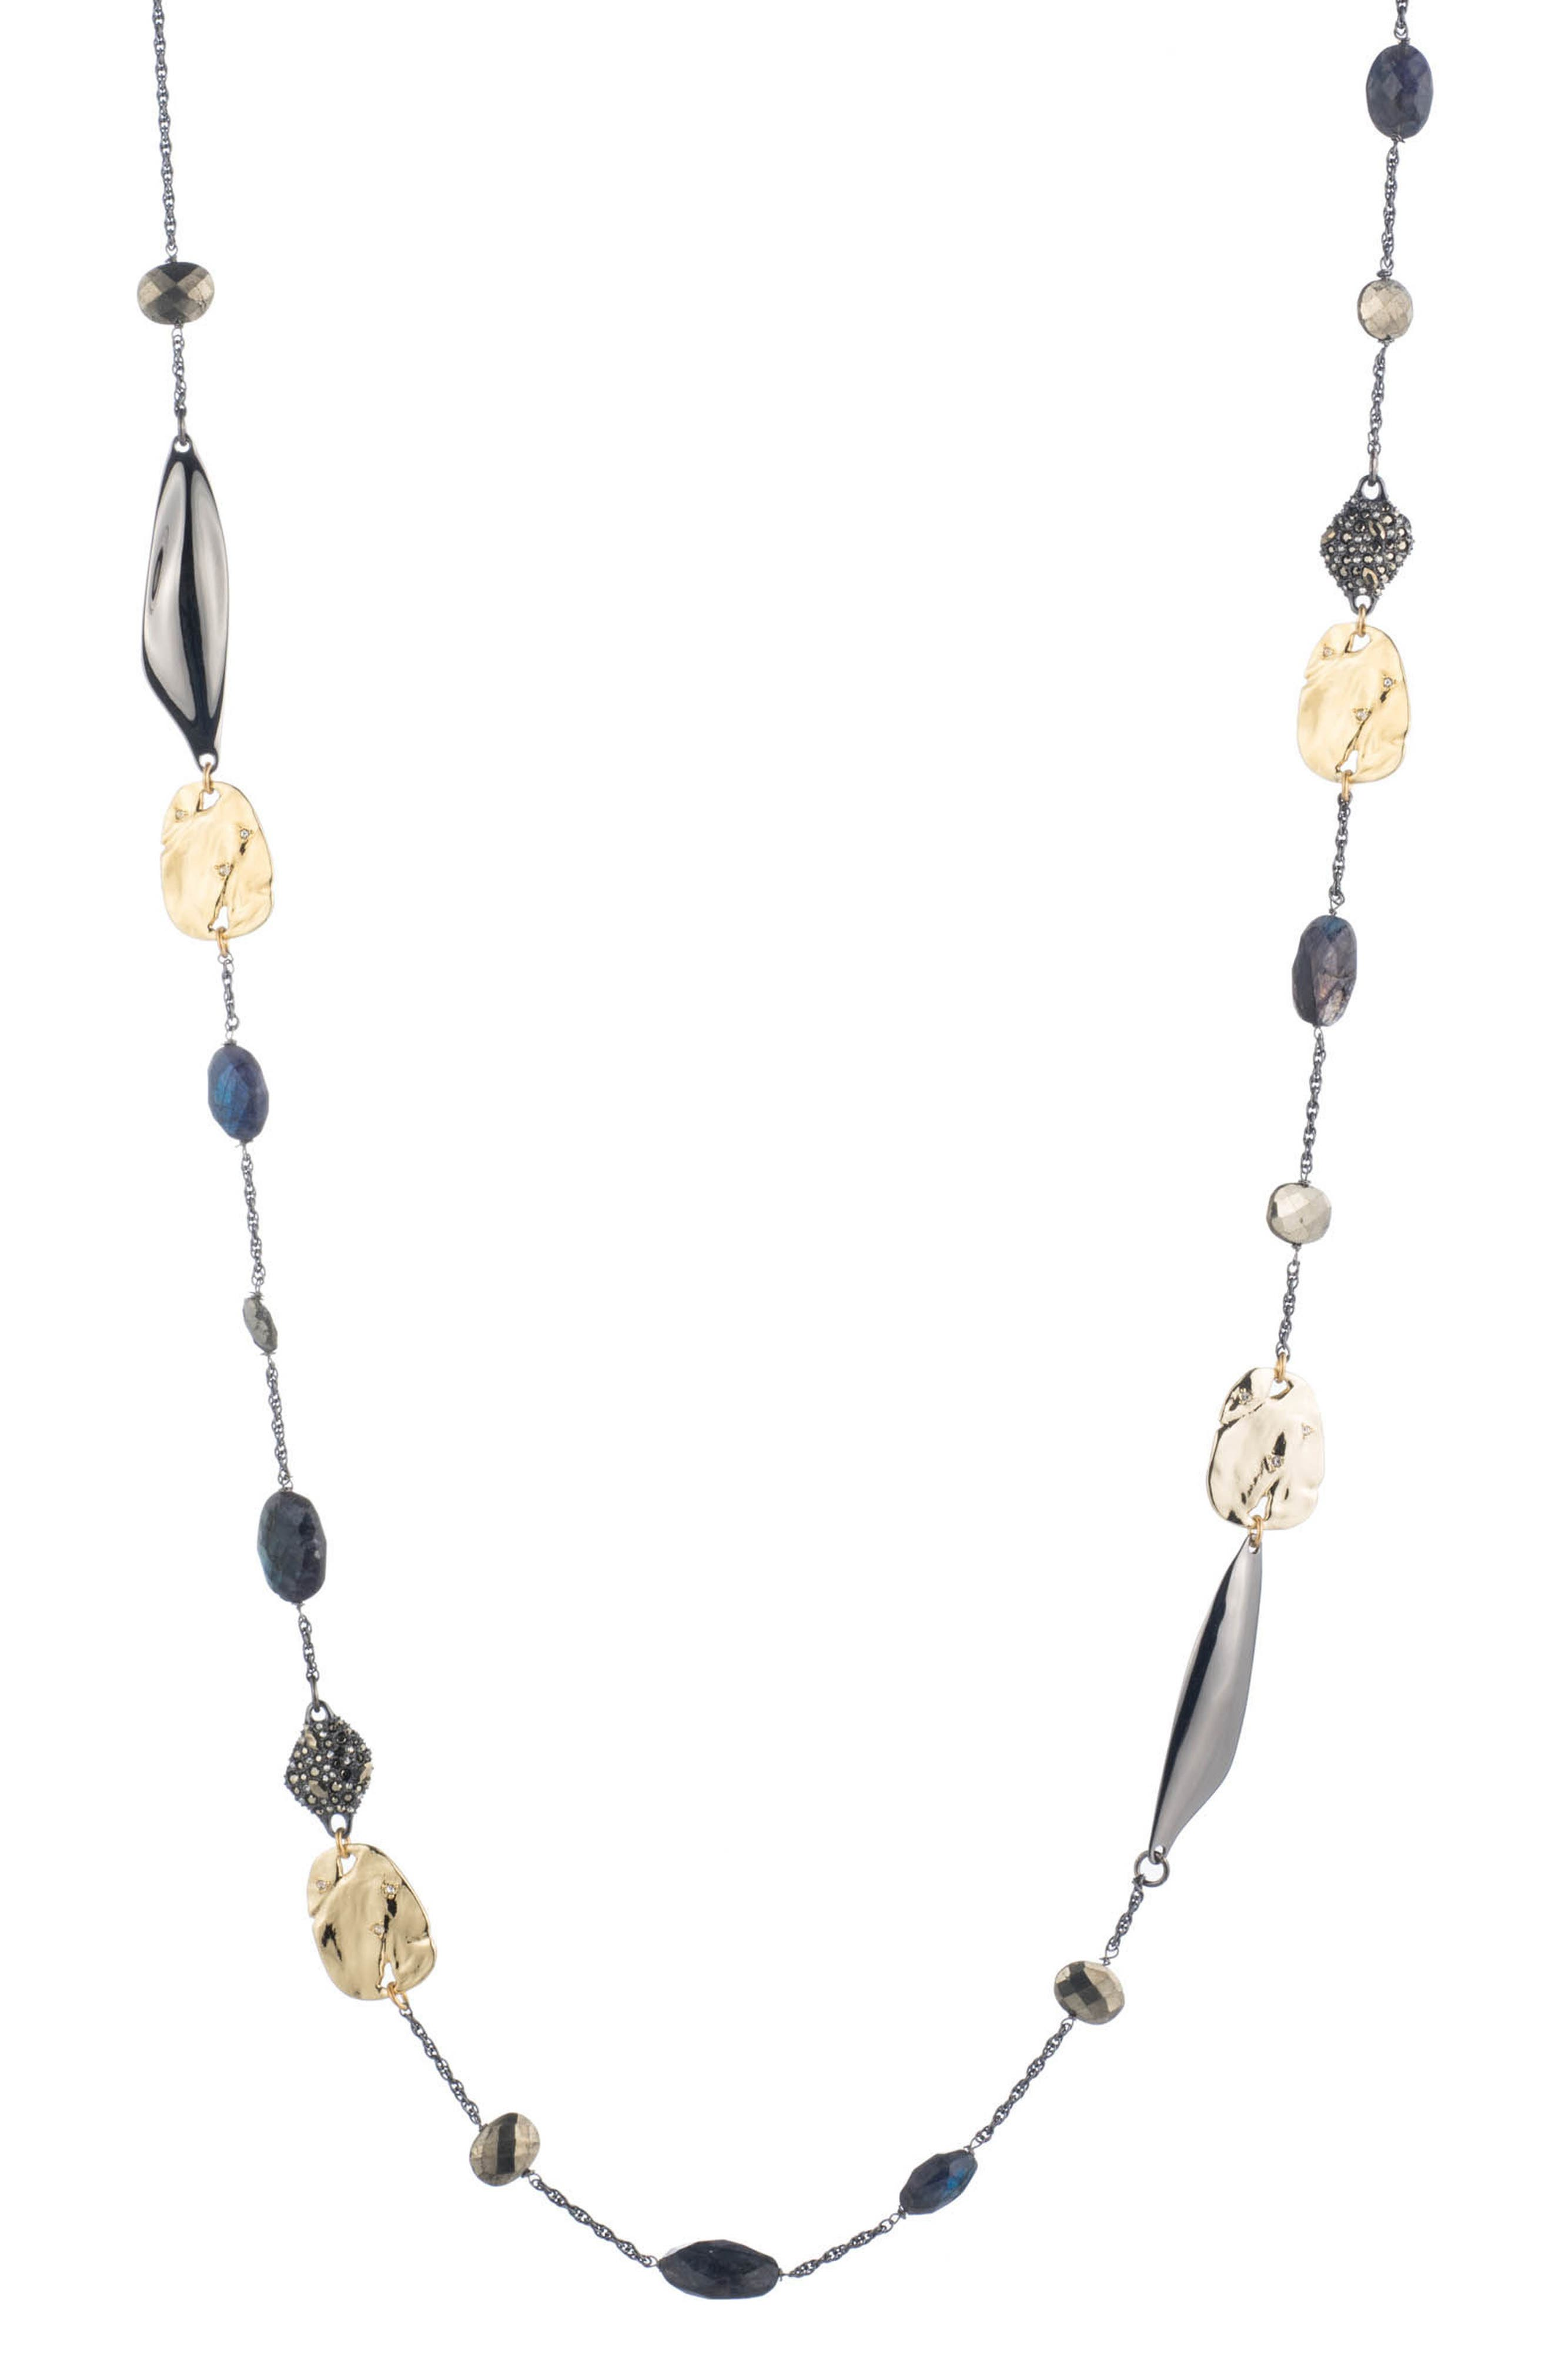 Alexis Bittar Elements Station Necklace